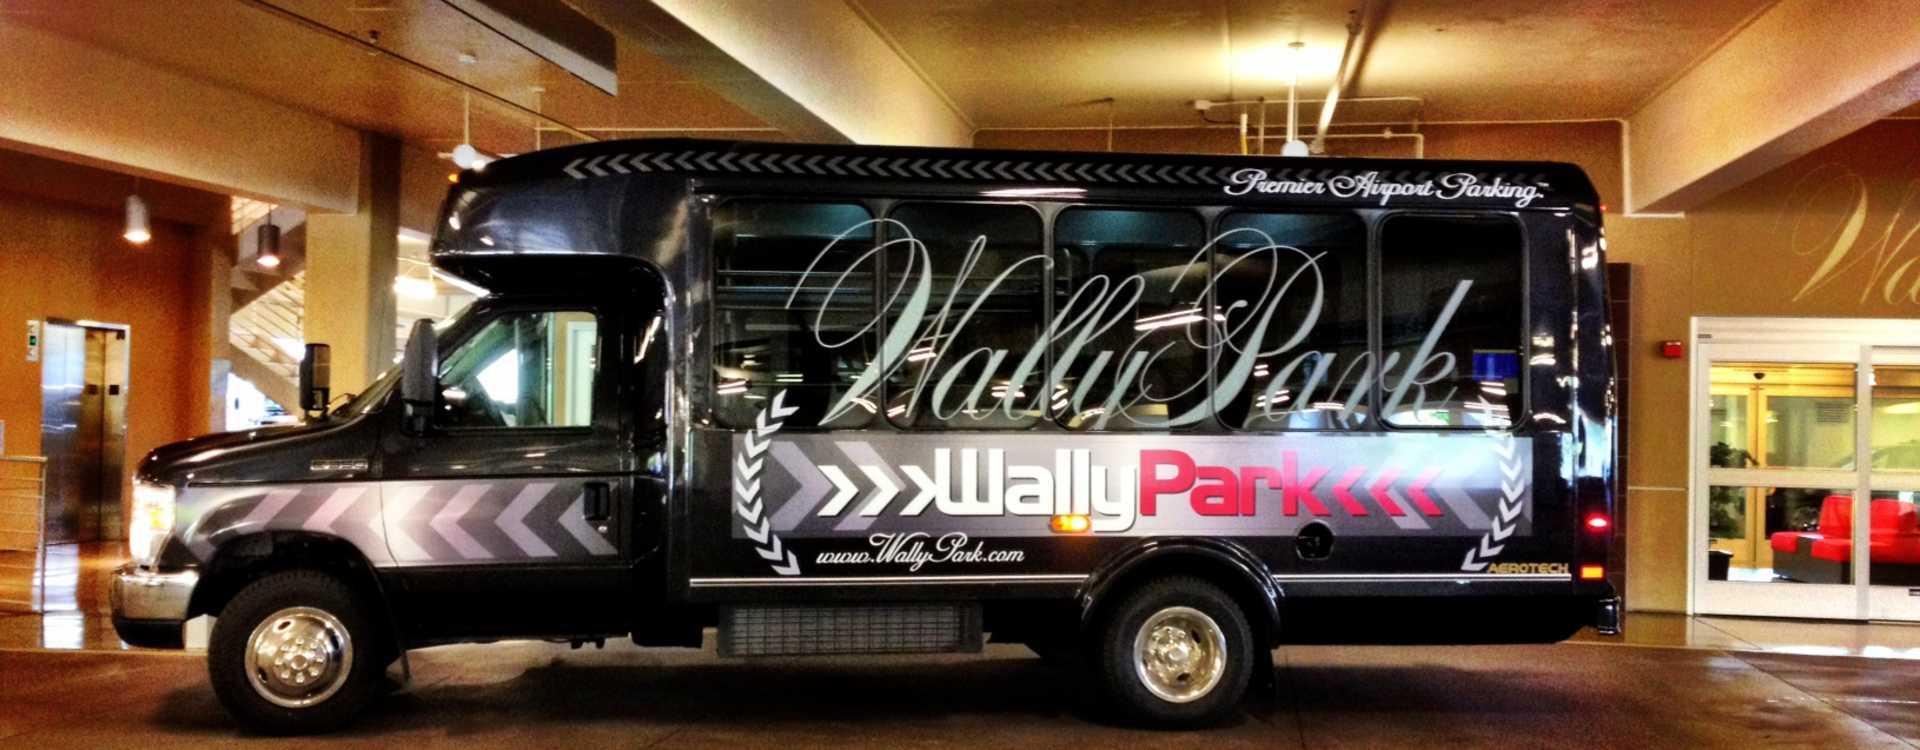 WallyPark_Airport_Parking.JPG